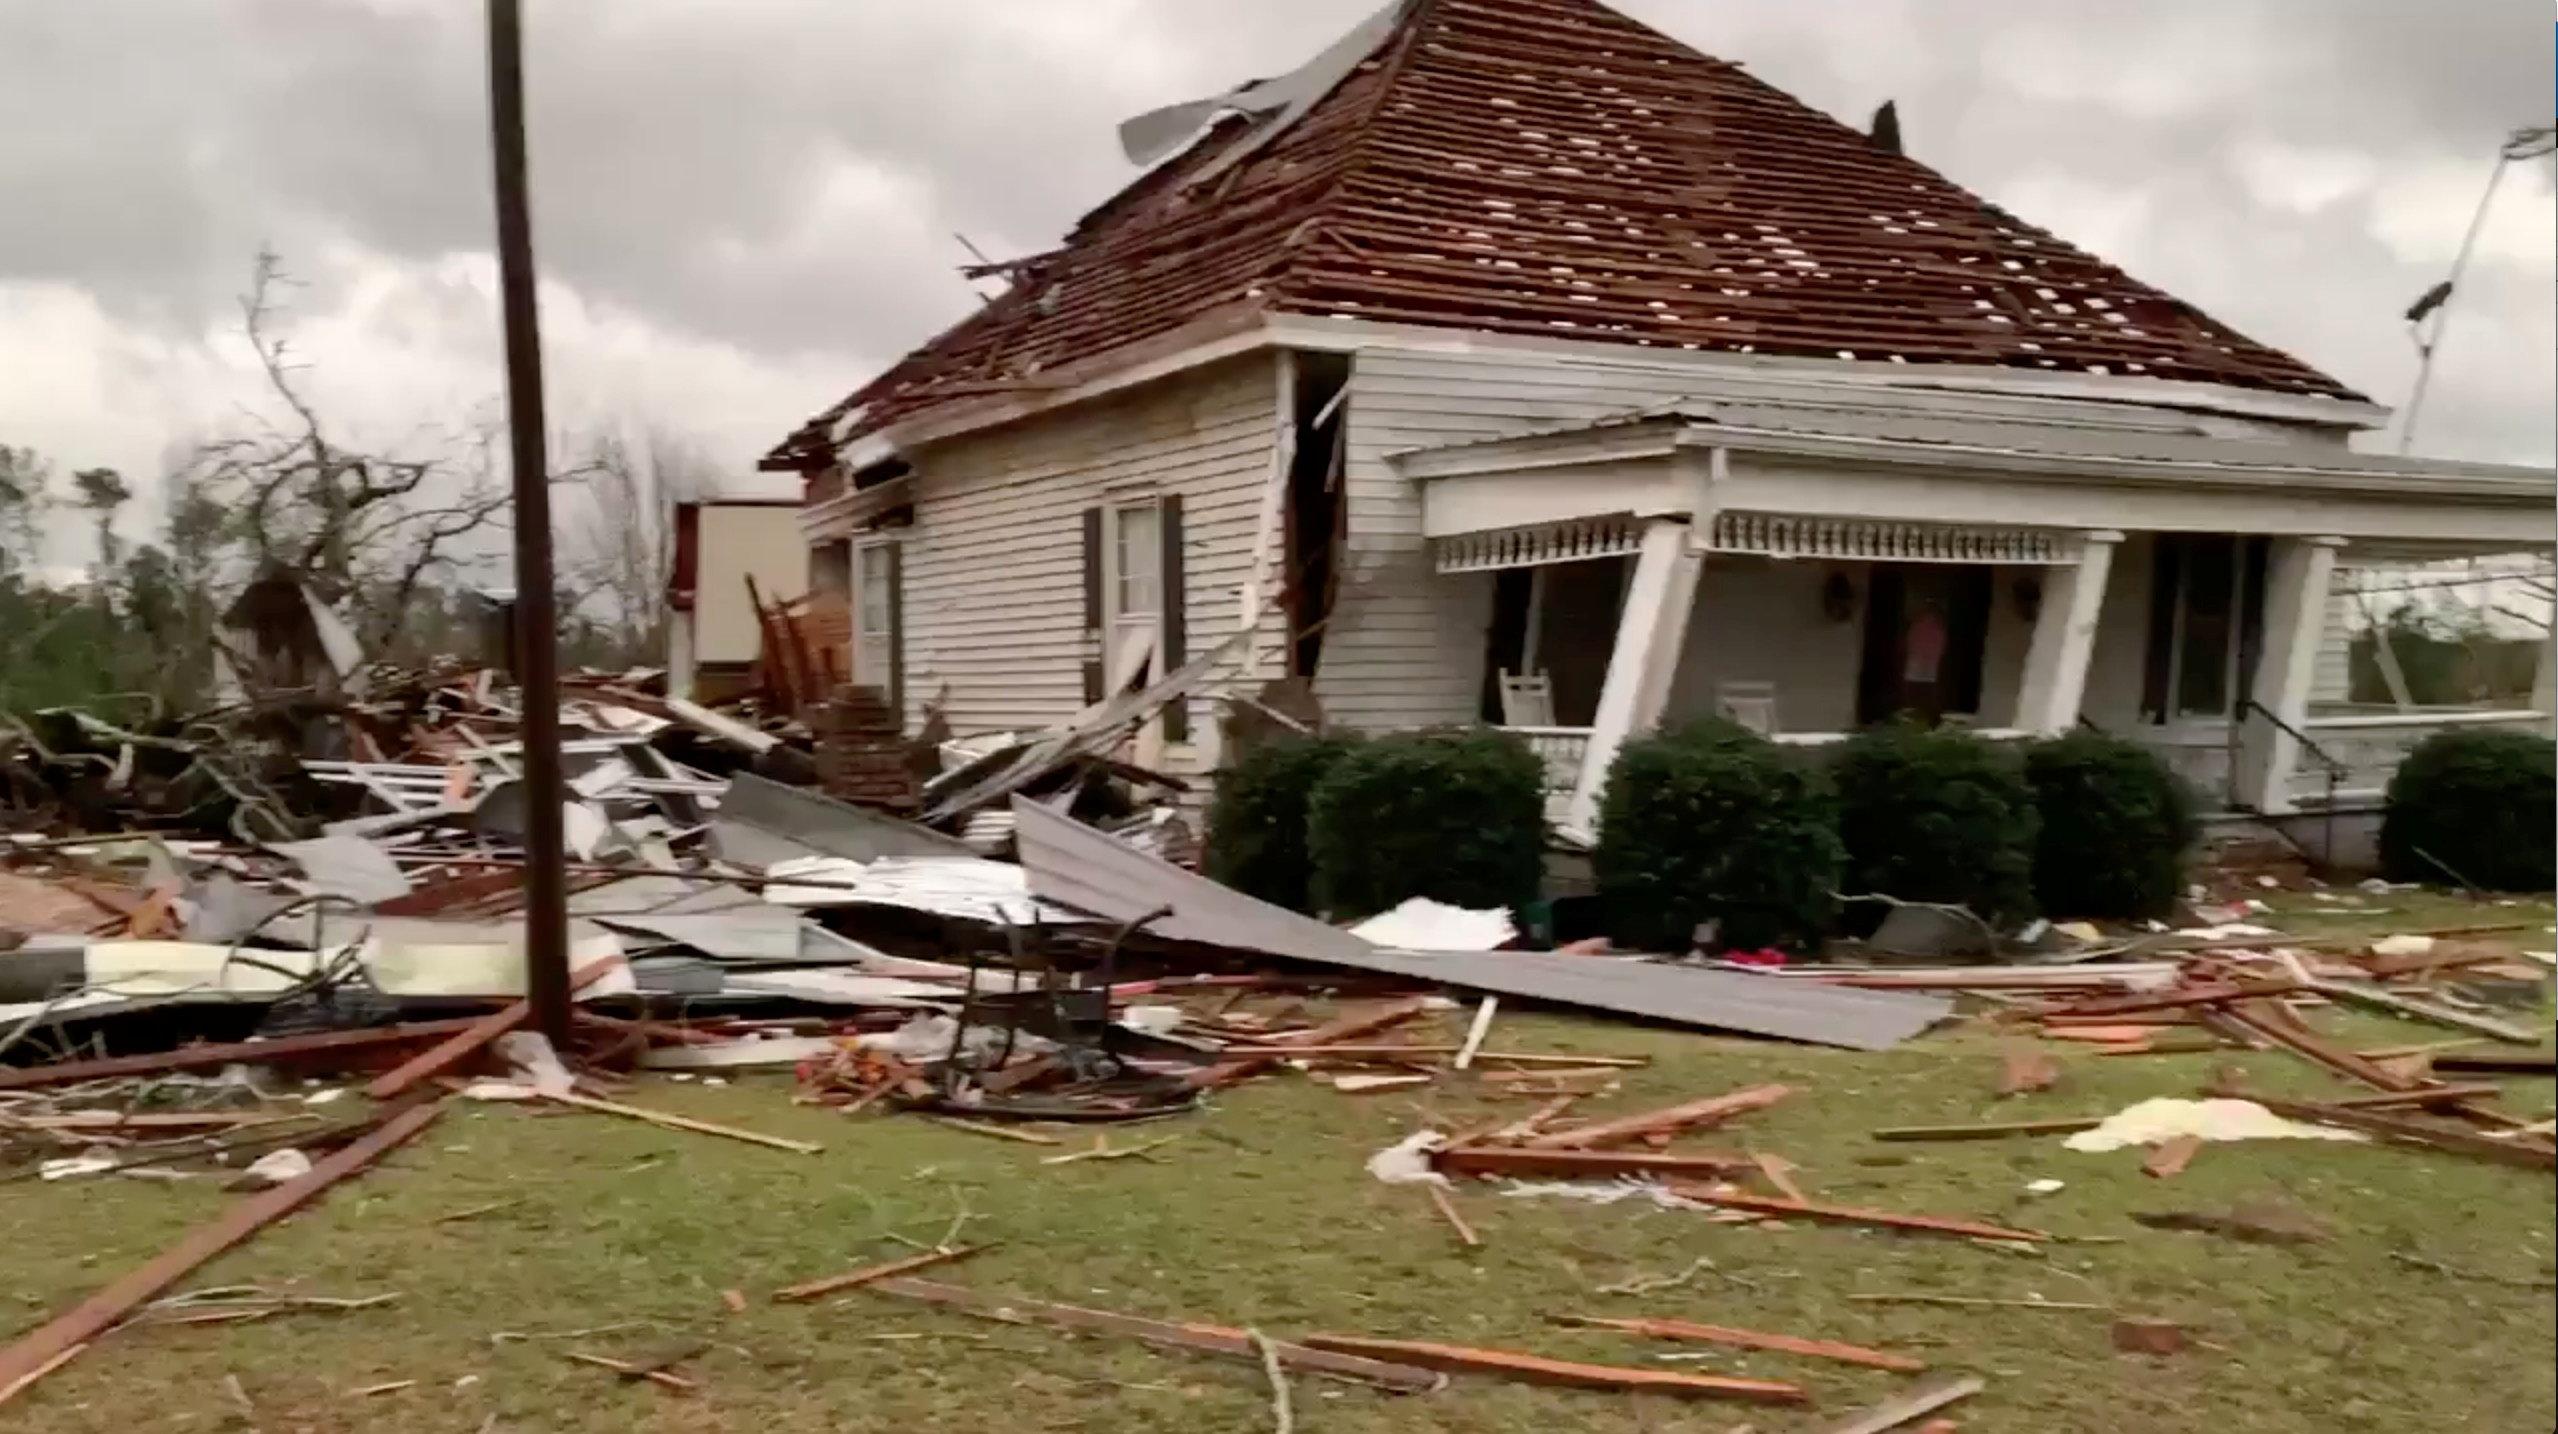 Debris and a damaged house seen following tornadoes in Beauregard.